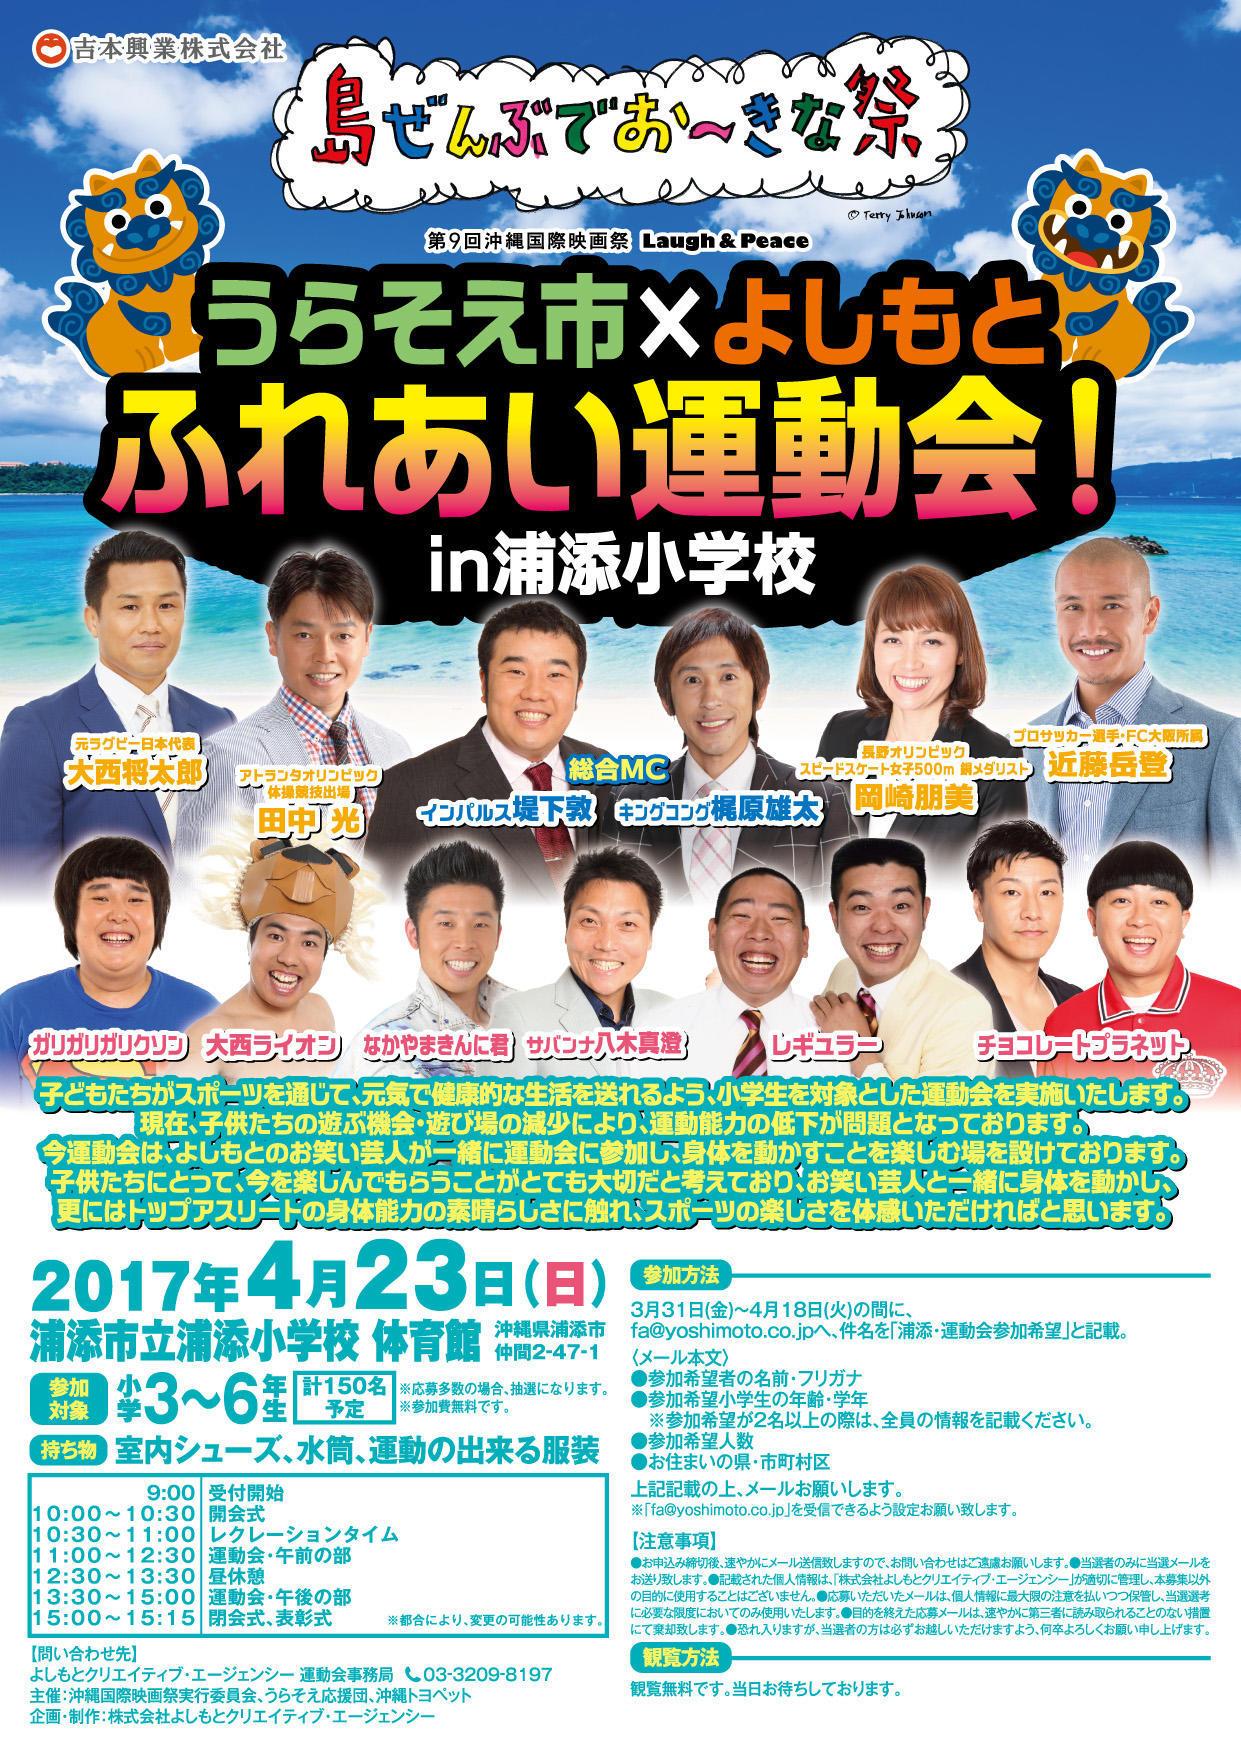 http://news.yoshimoto.co.jp/20170331150016-8dd30c07a995b1fe6917c3095533bedef6048722.jpg